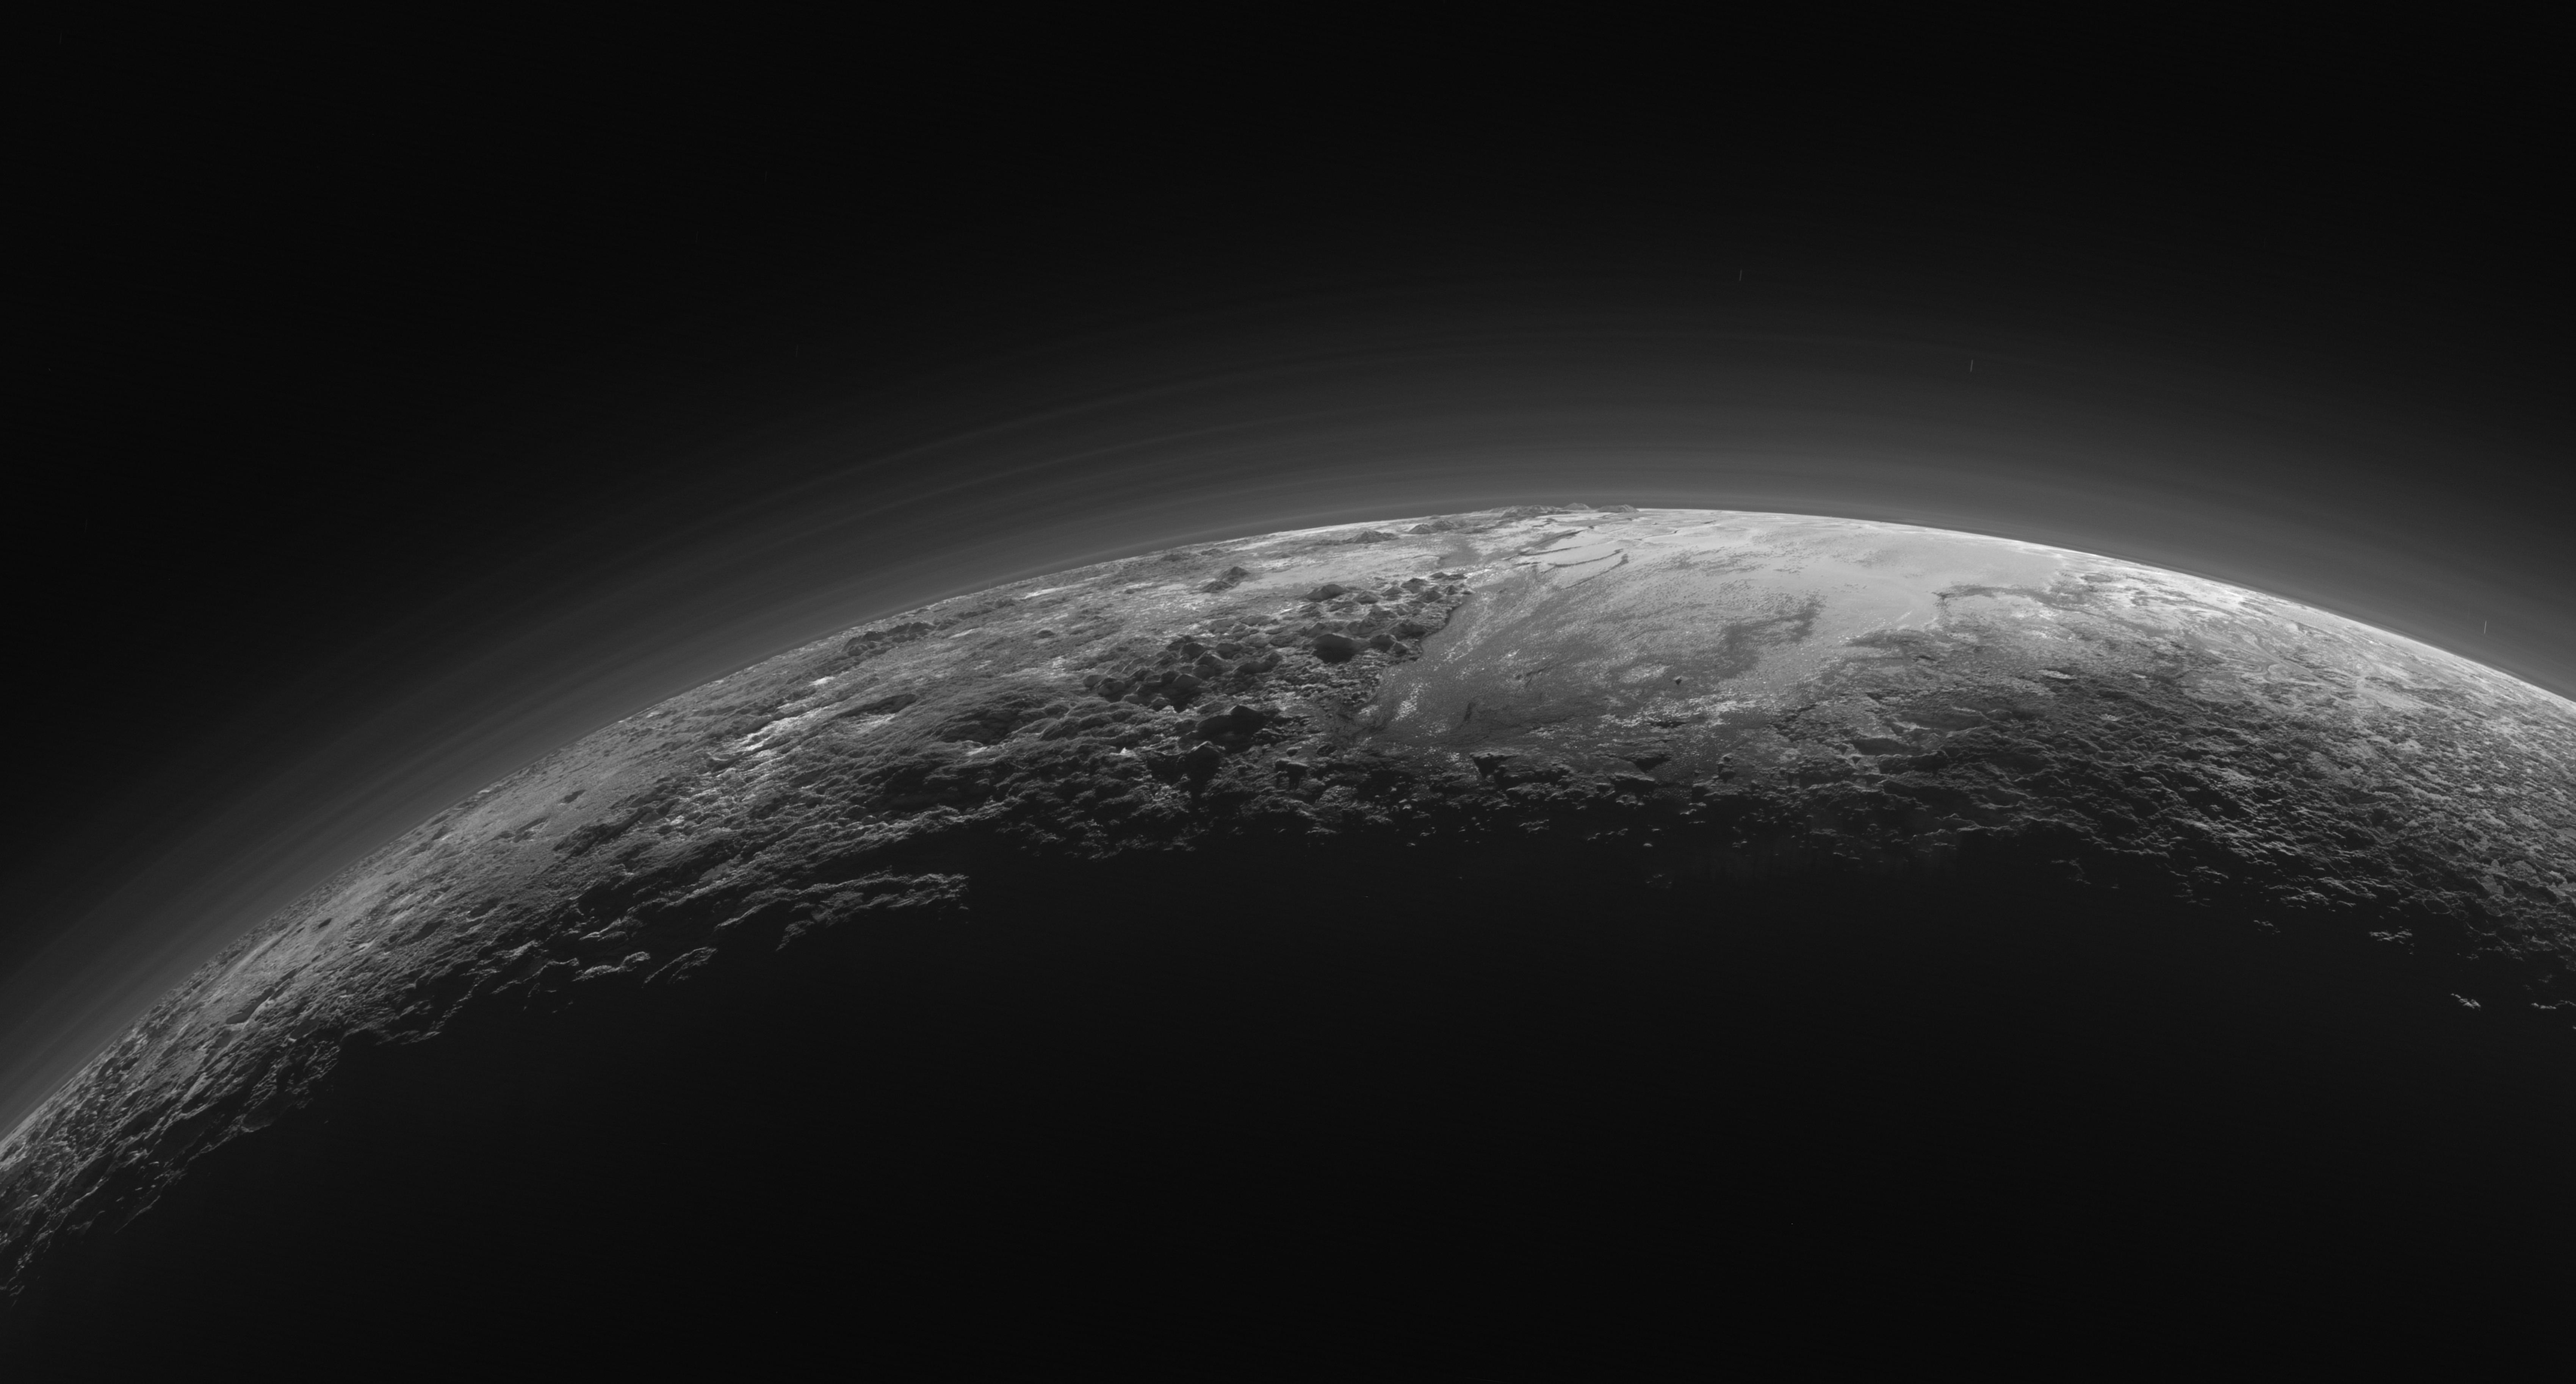 High Resolution Wallpaper | Pluto 6797x3652 px